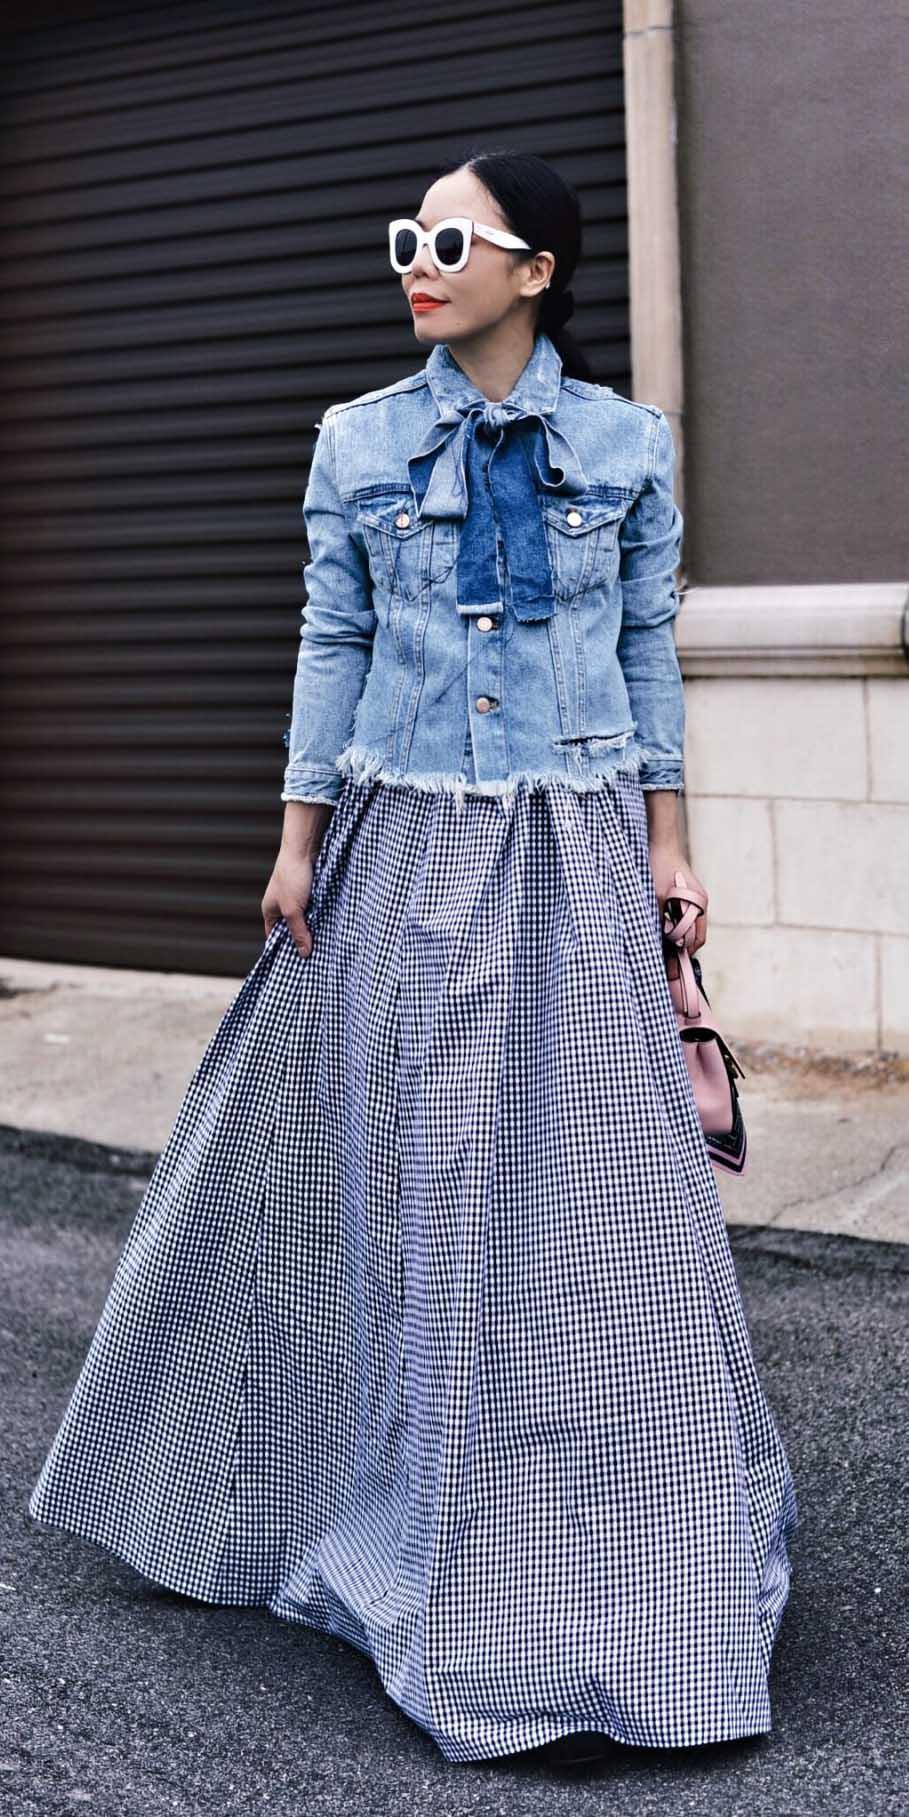 blue-light-jacket-jean-sun-brun-pony-gingham-blue-med-maxi-skirt-spring-summer-lunch.jpg